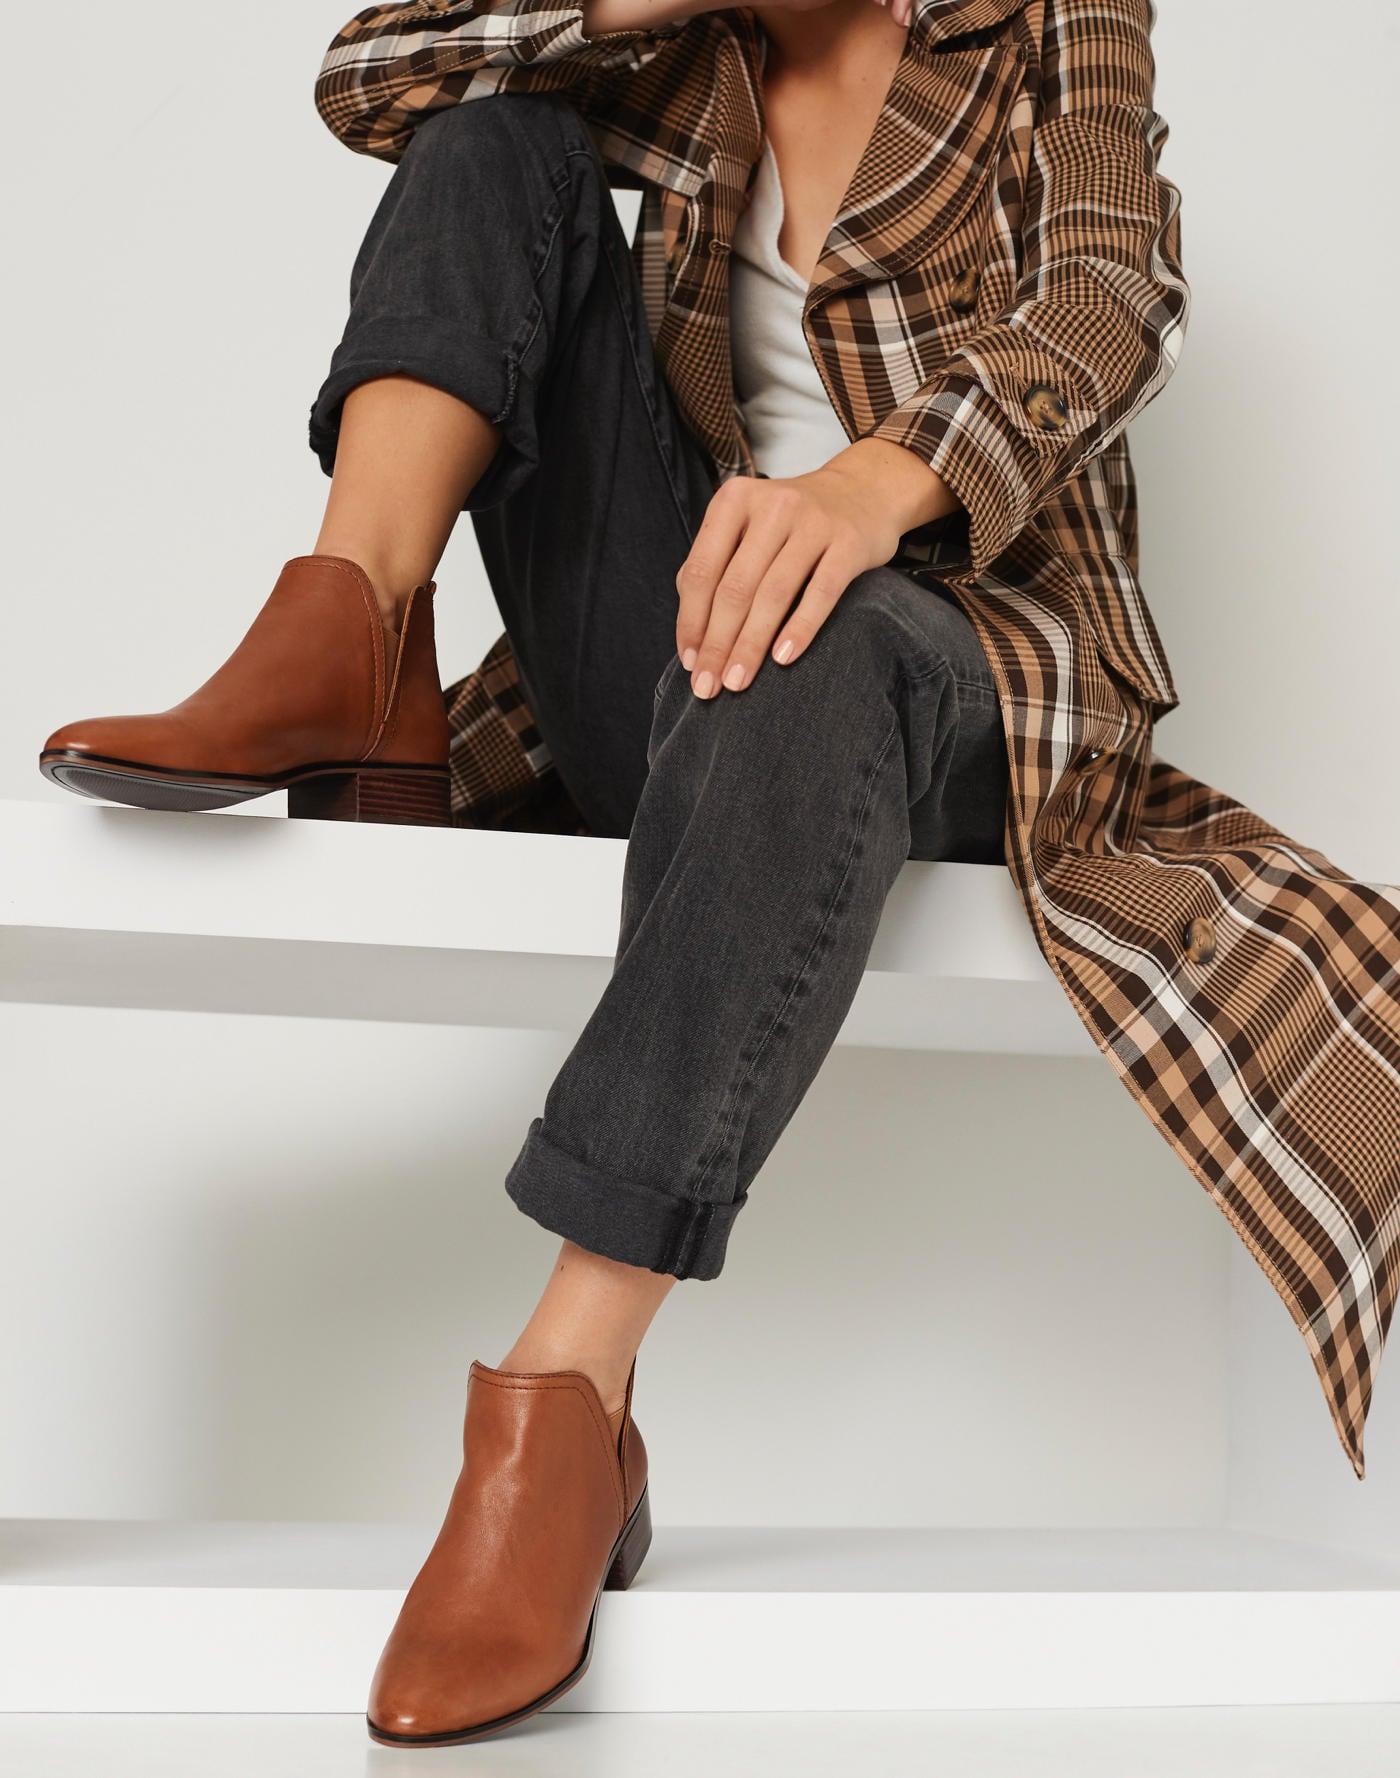 ddfc60230e5 Boots